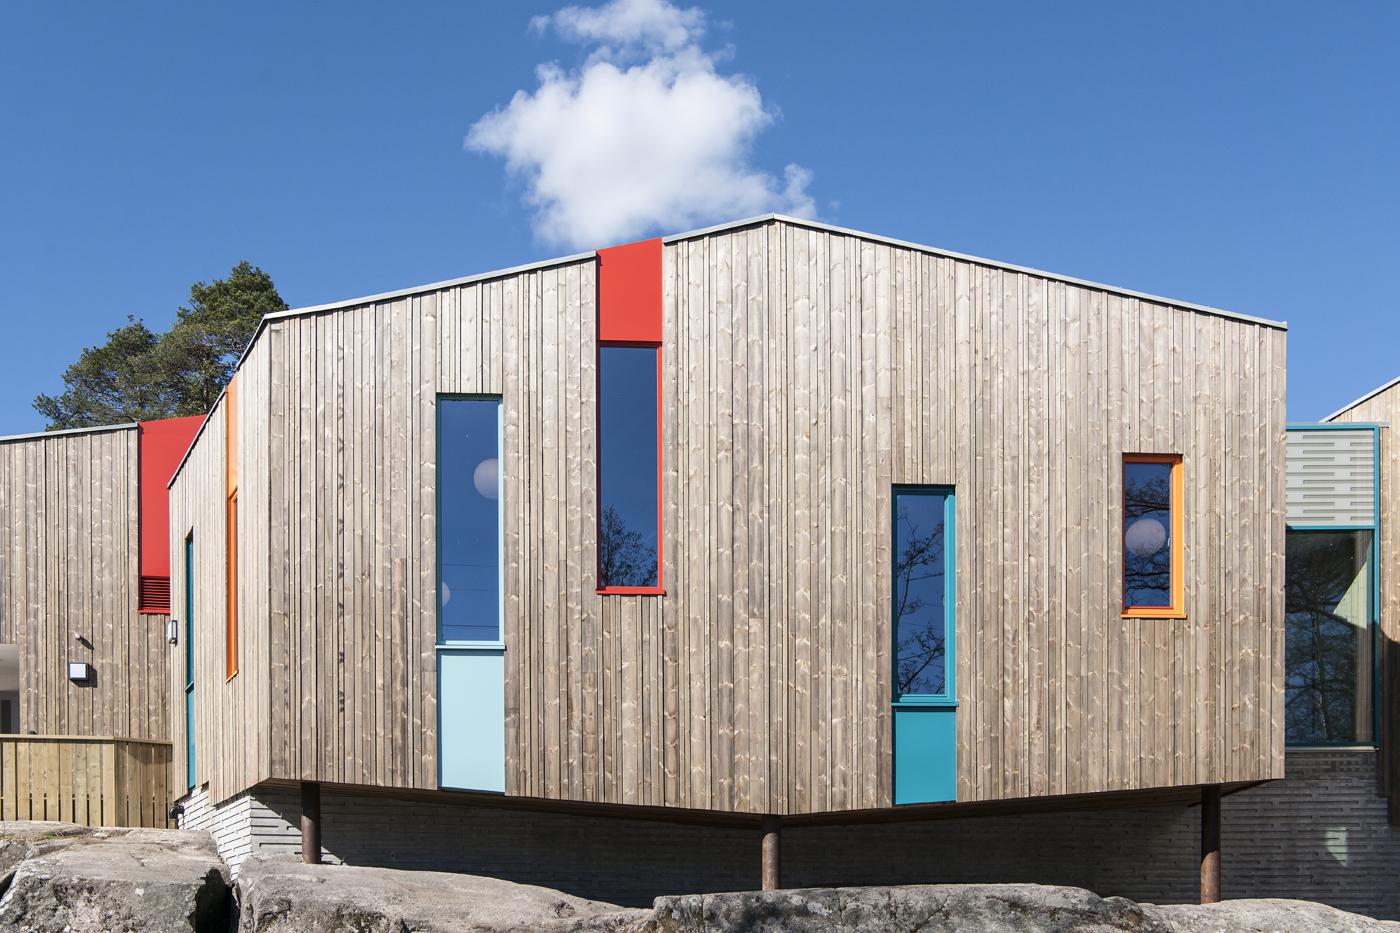 Foto: Jiri Havran/LINK arkitektur